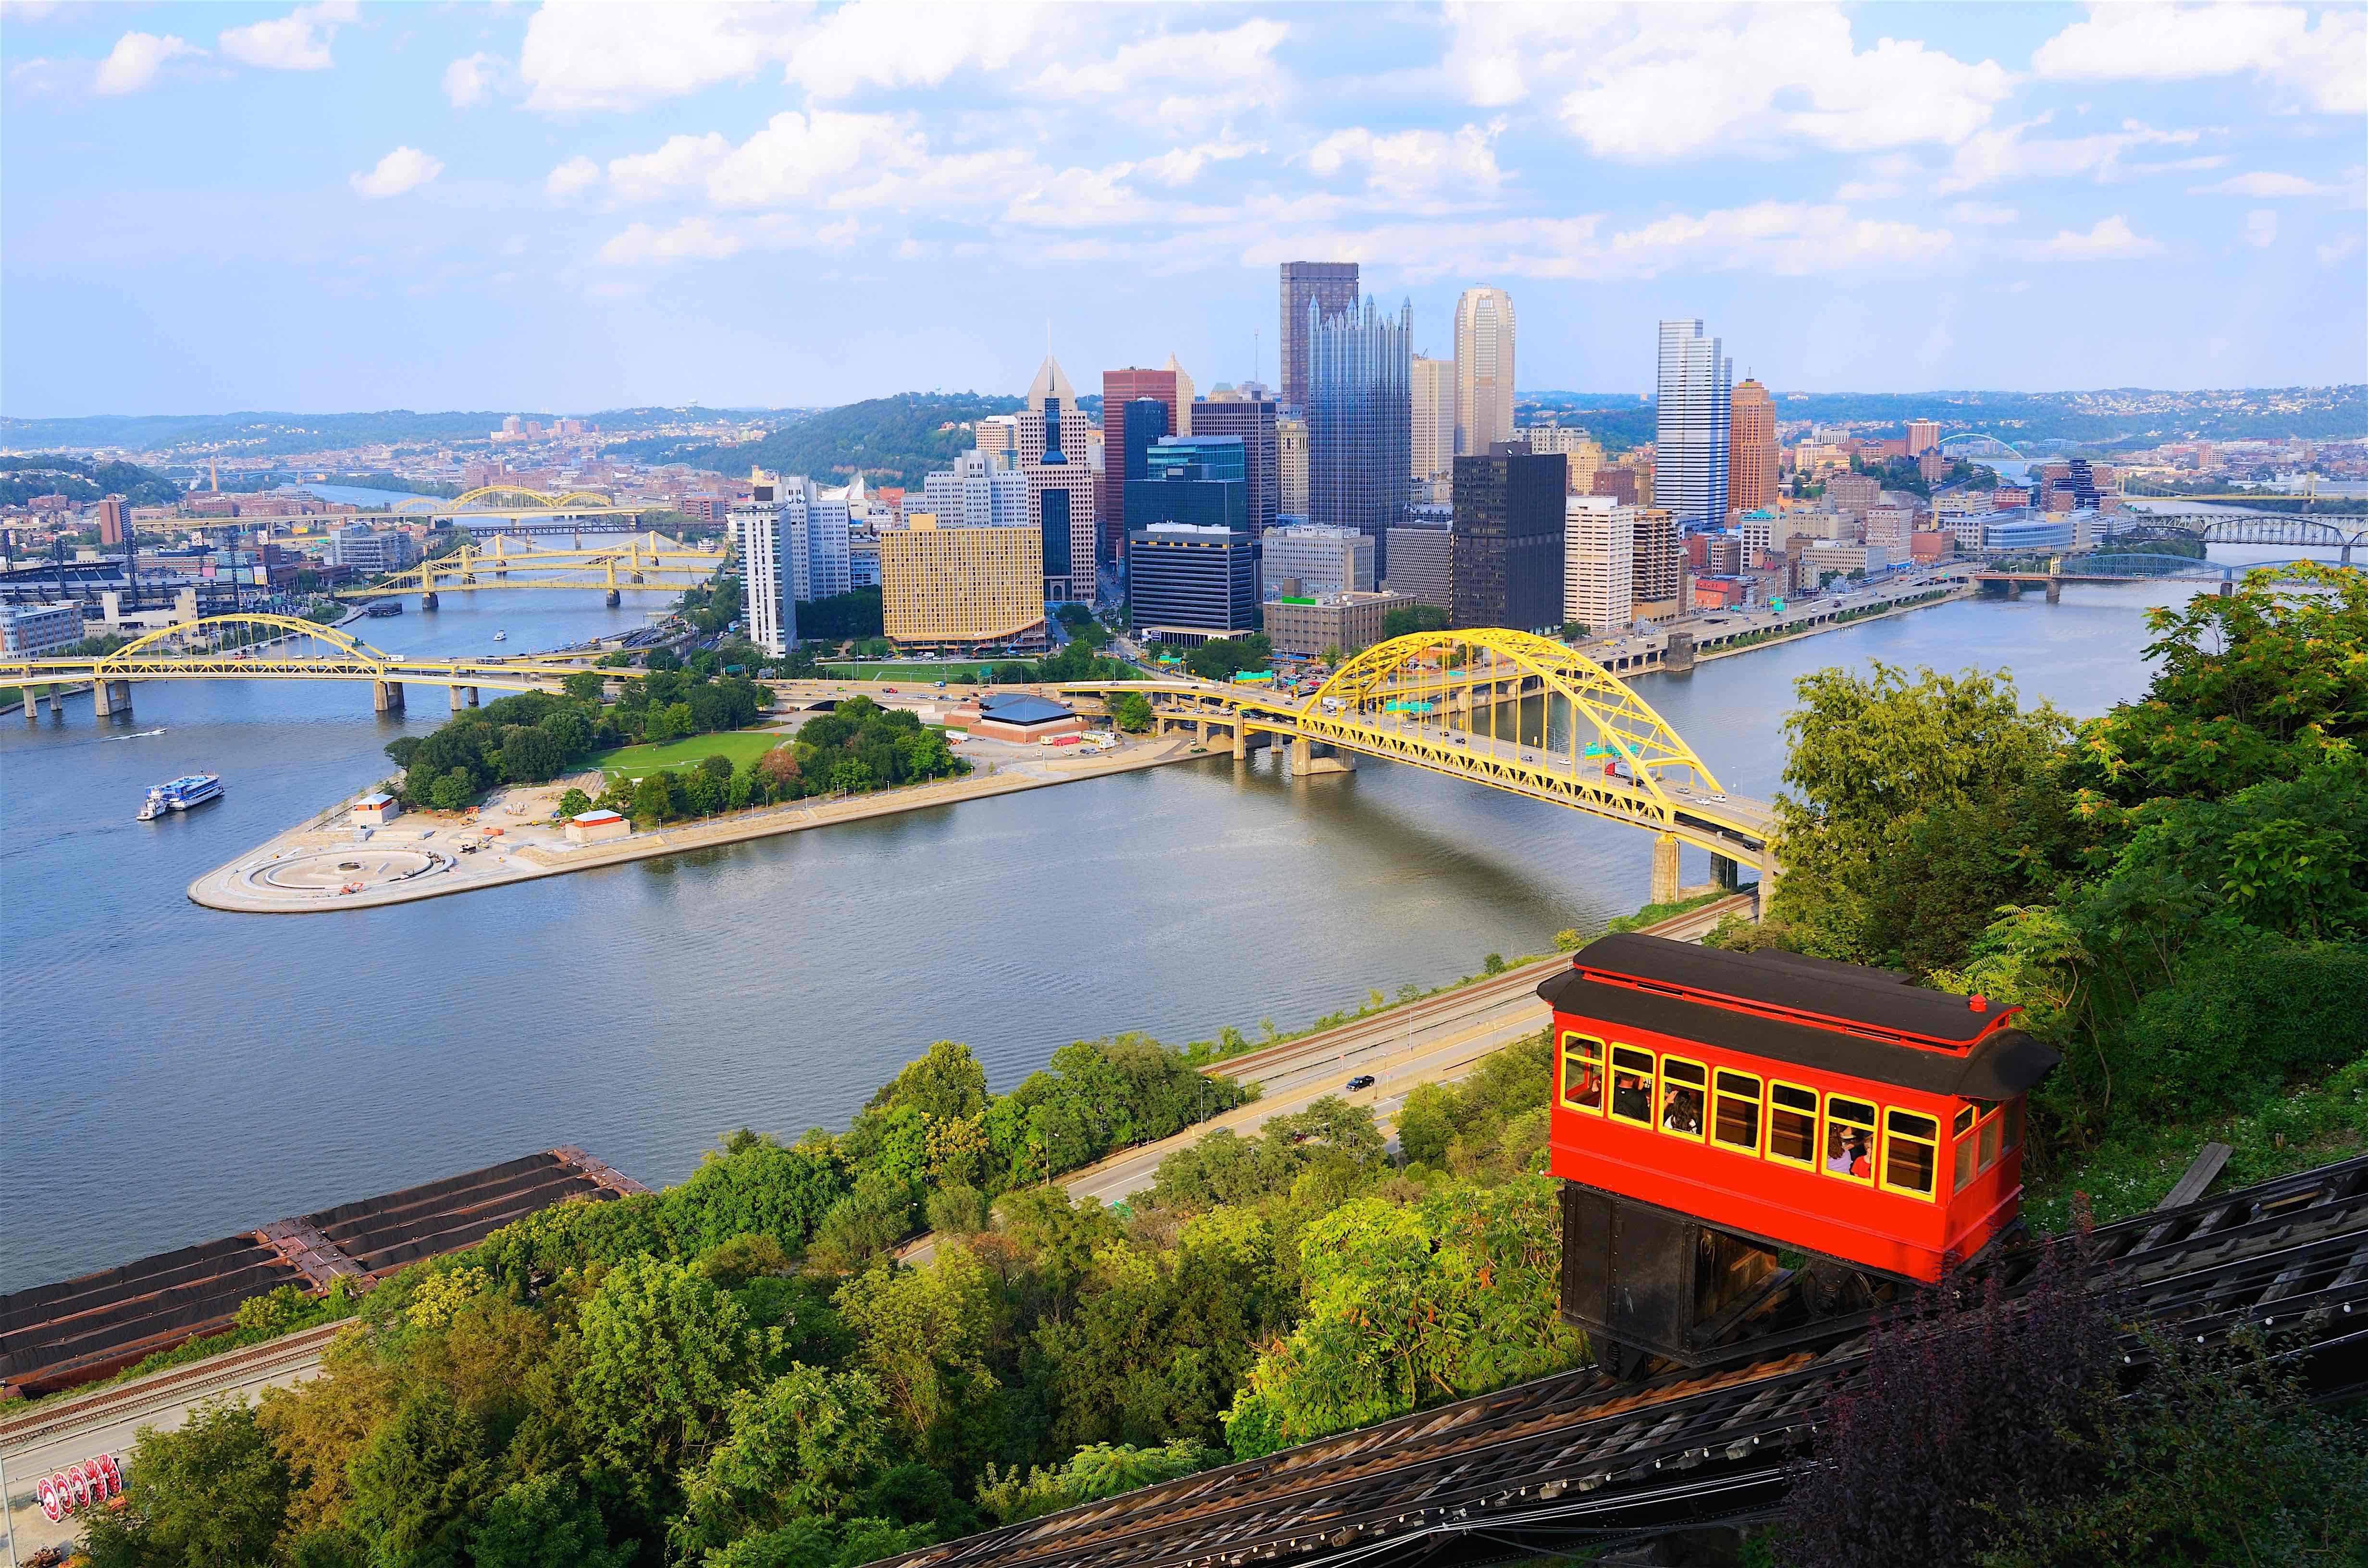 7.) Pittsburgh, PA